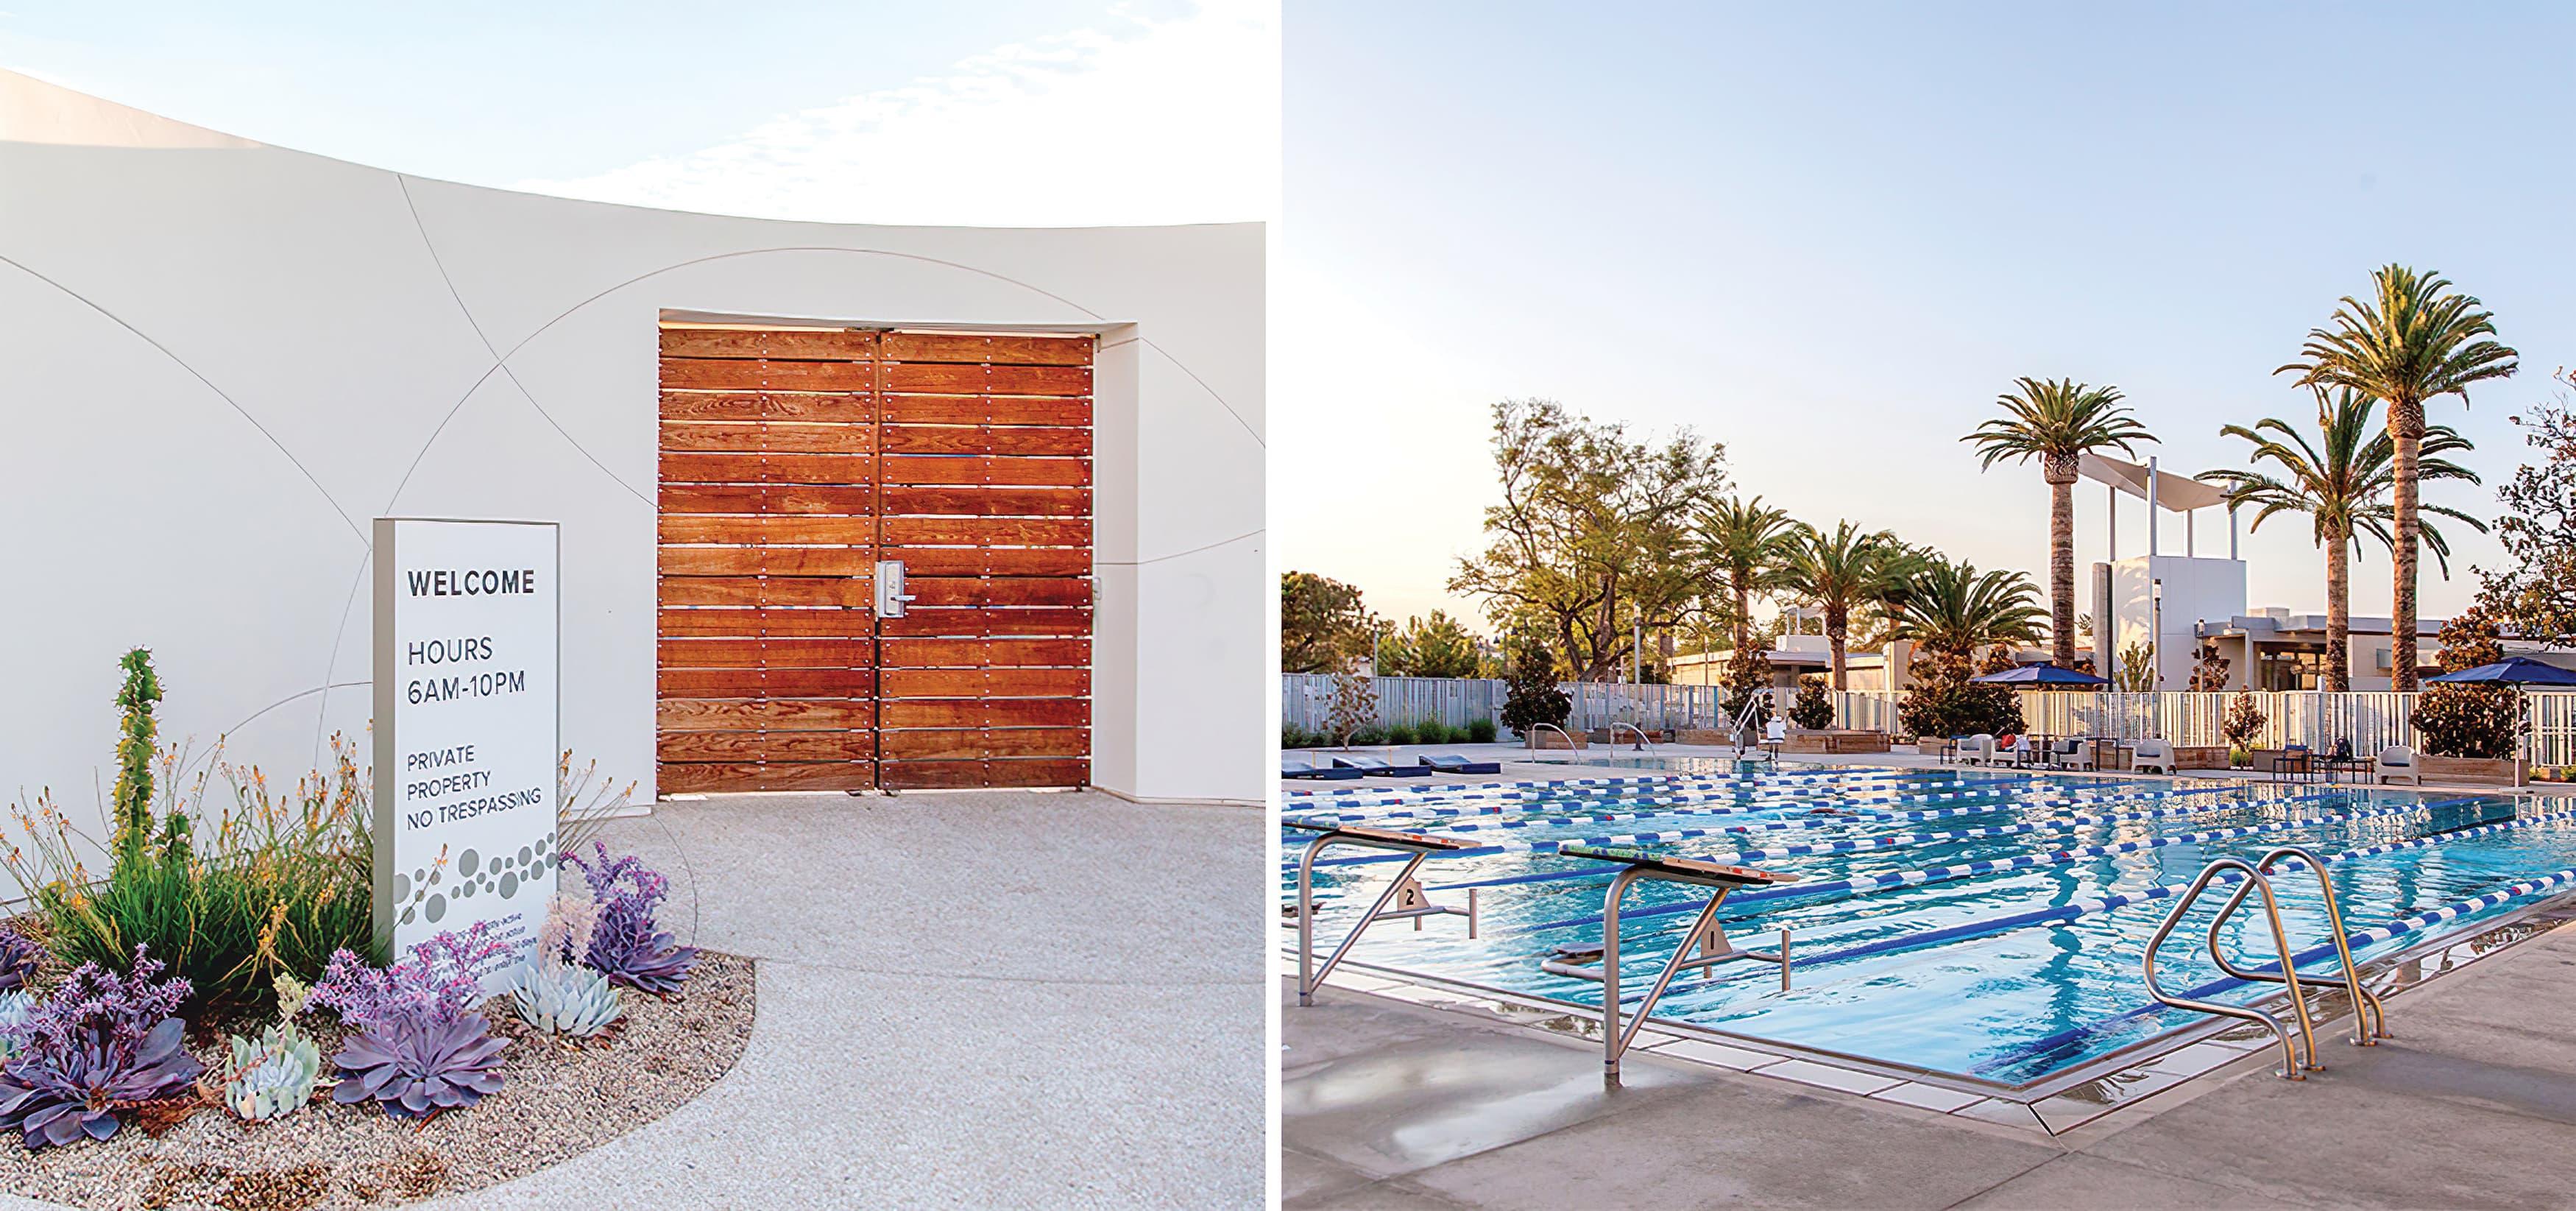 The Pools, a residential community park in Irvine, California. RSM Design prepared identity signage and regulatory signage. Park Design.